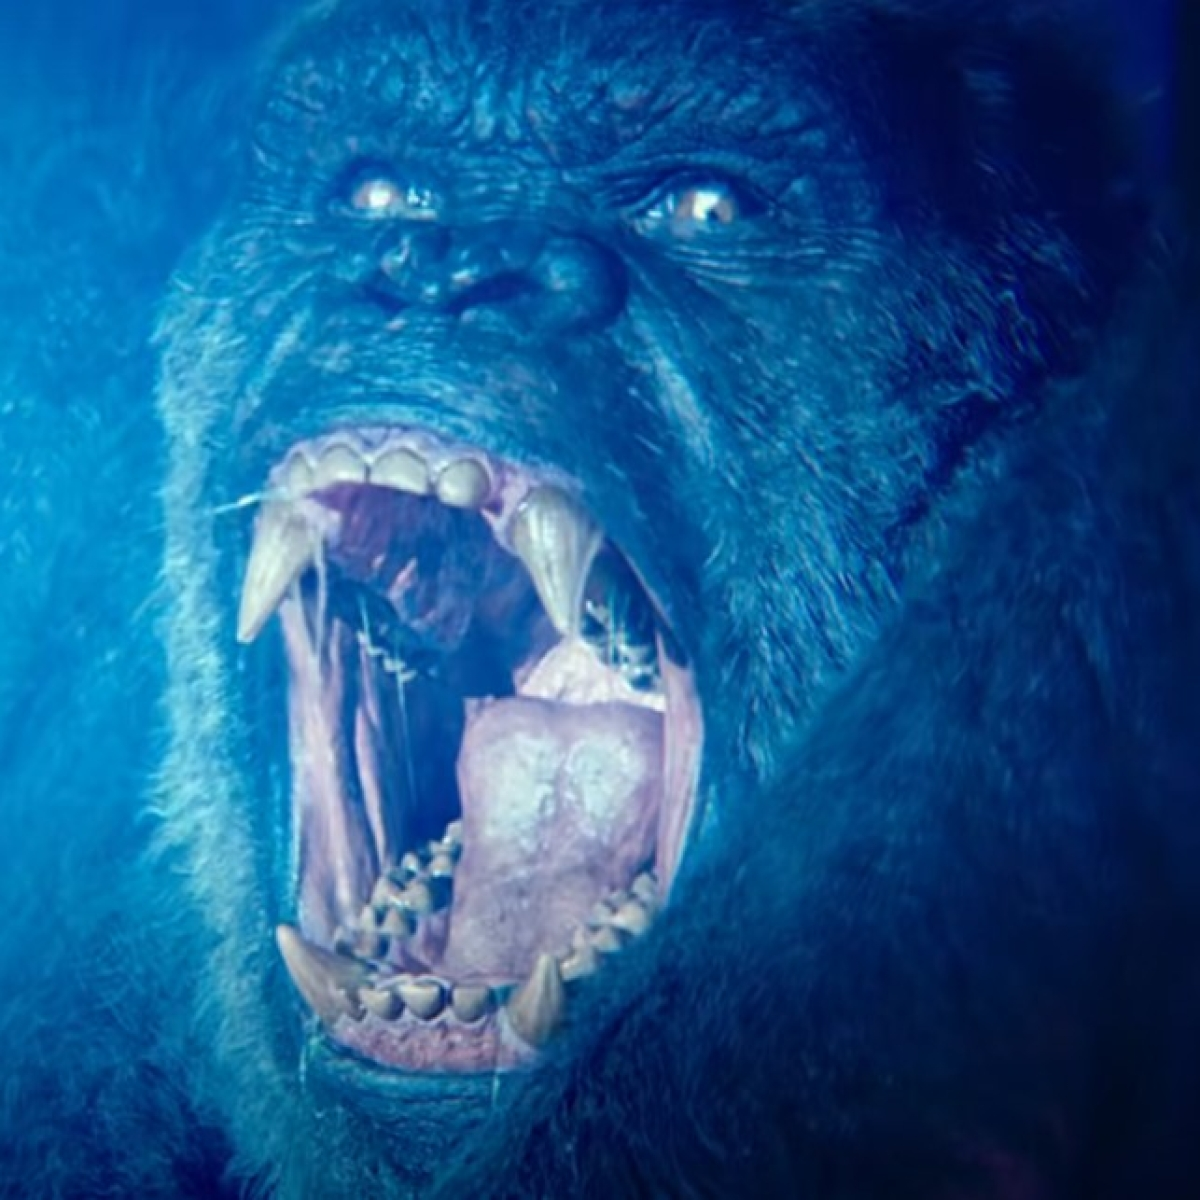 'Godzilla vs. Kong' Trailer: Watch the epic clash of mega-sized monsters